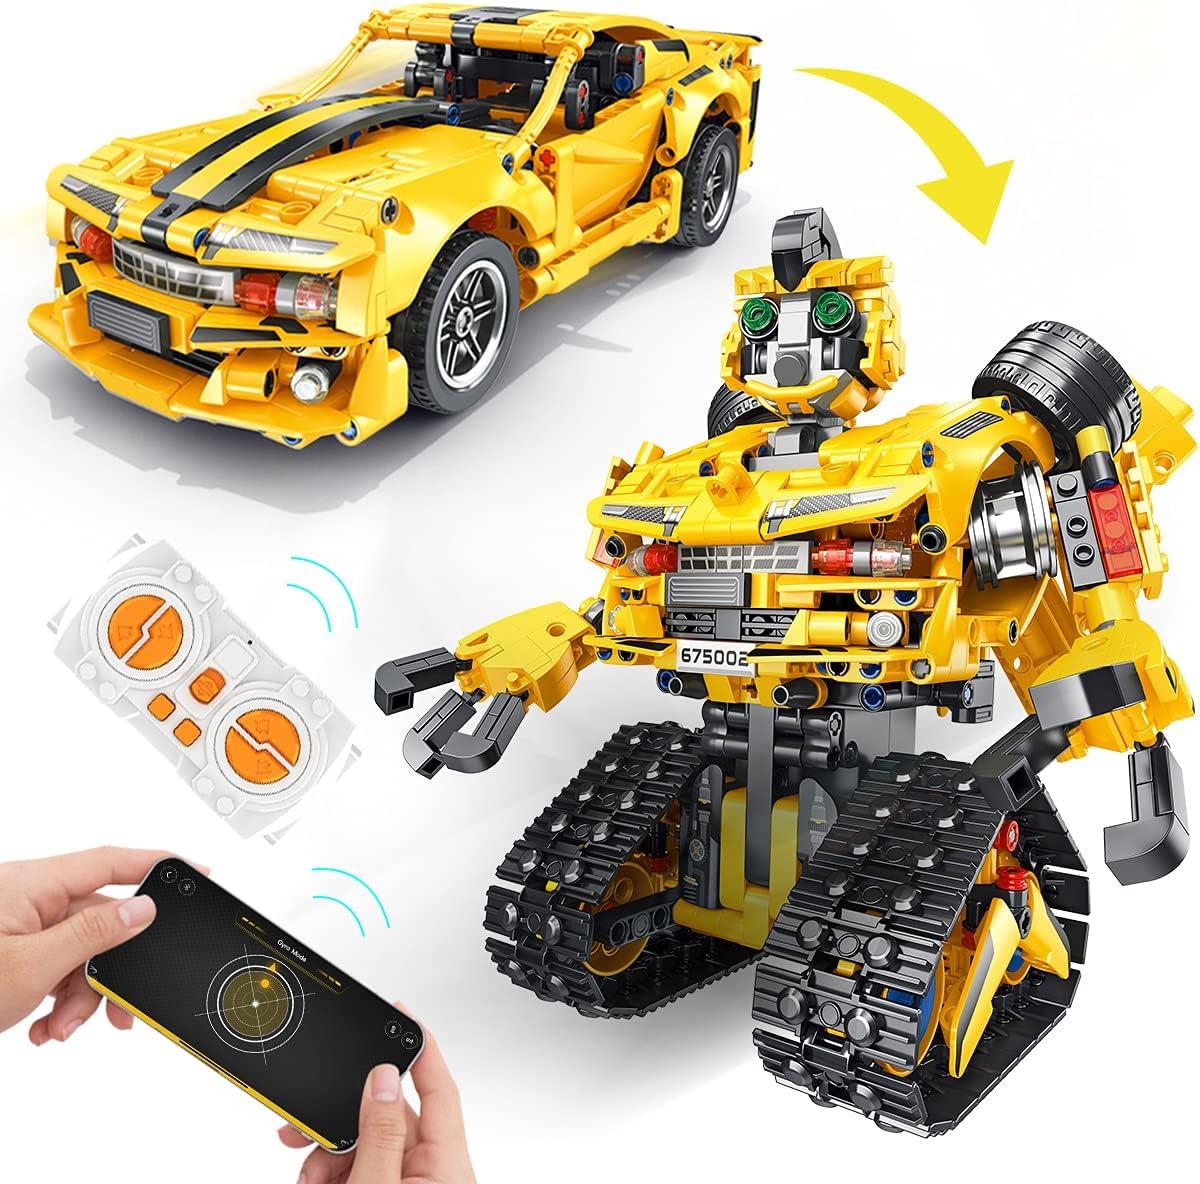 PANLOS Manufacturer OFFicial shop 2 in 1 RC Car Mail order Building Block Vehicle Programma Toys Robot